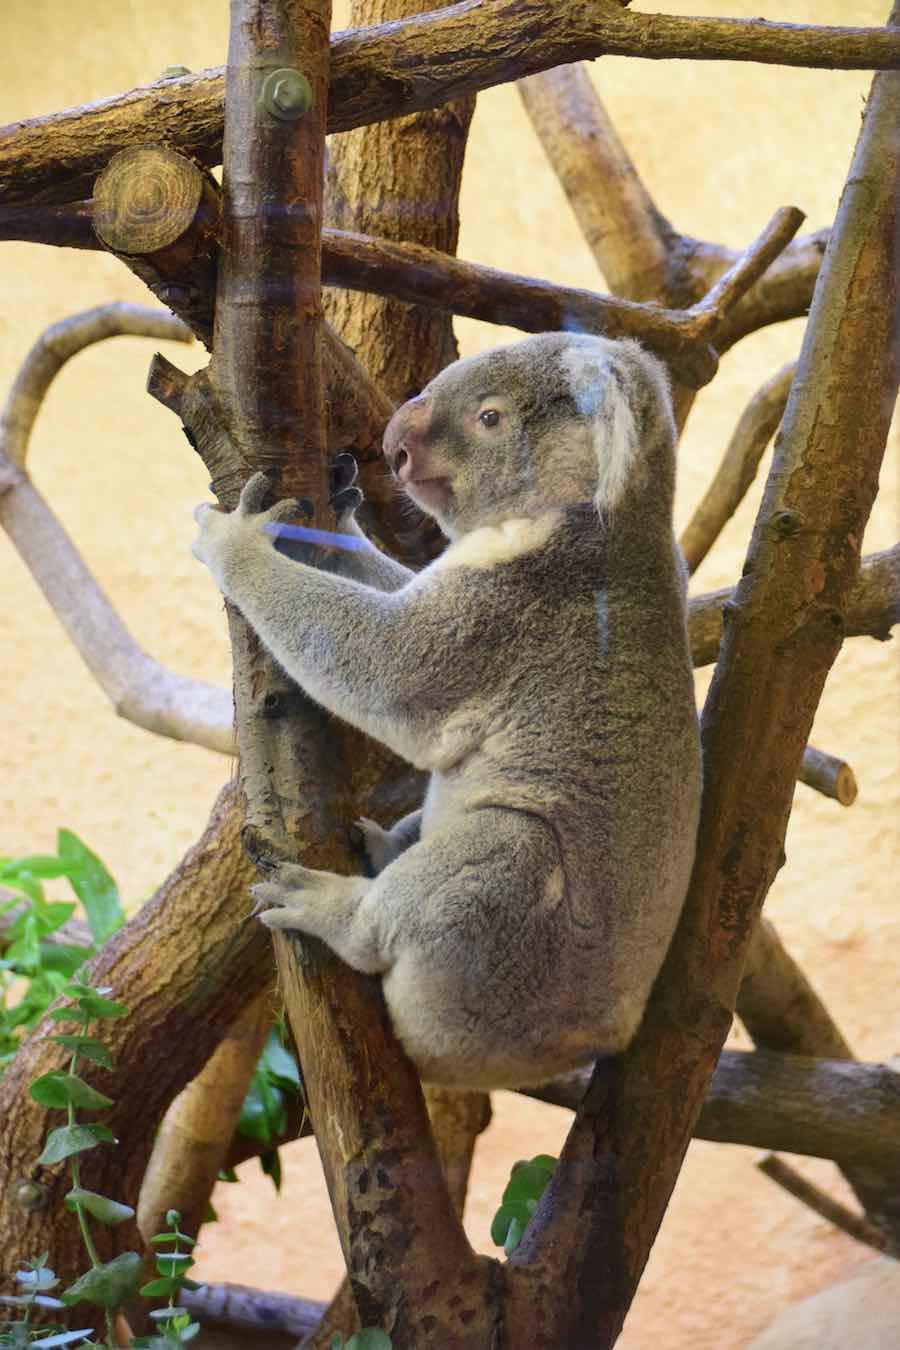 Ein Koalabär im Zoo Dresden